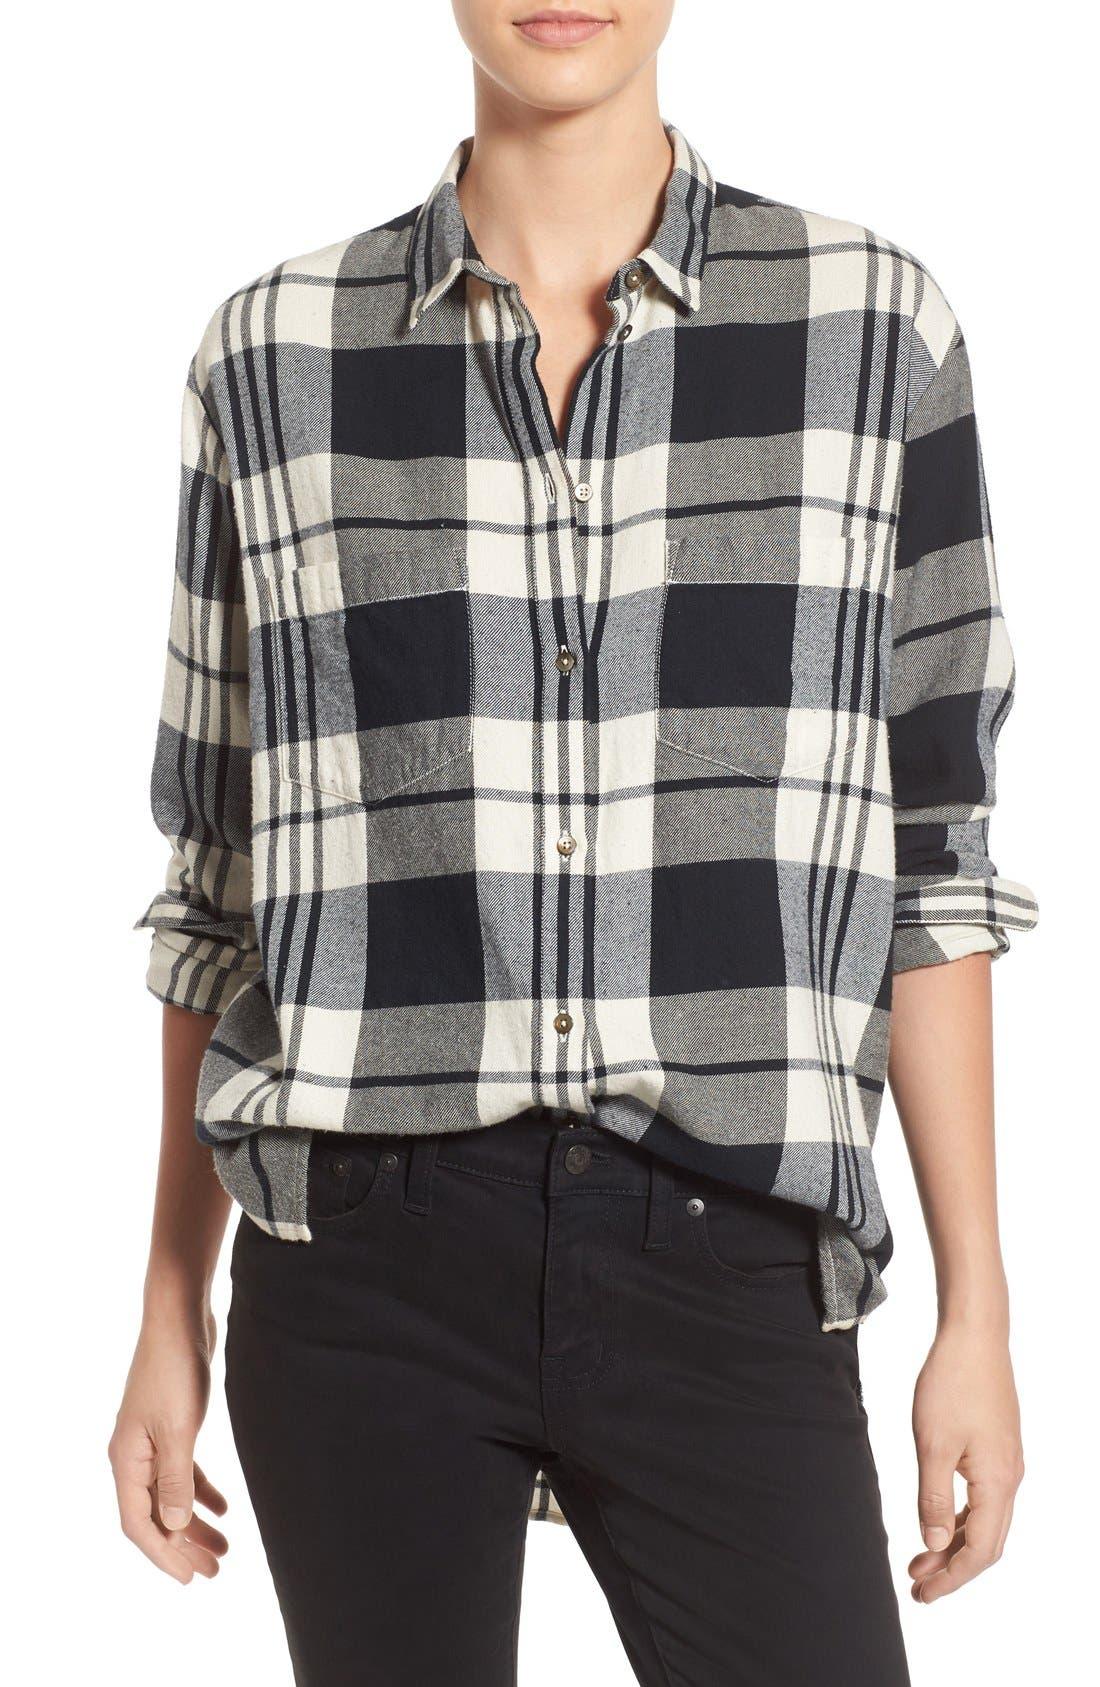 Main Image - Madewell 'Ex Boyfriend' Plaid Oversize Cotton Shirt